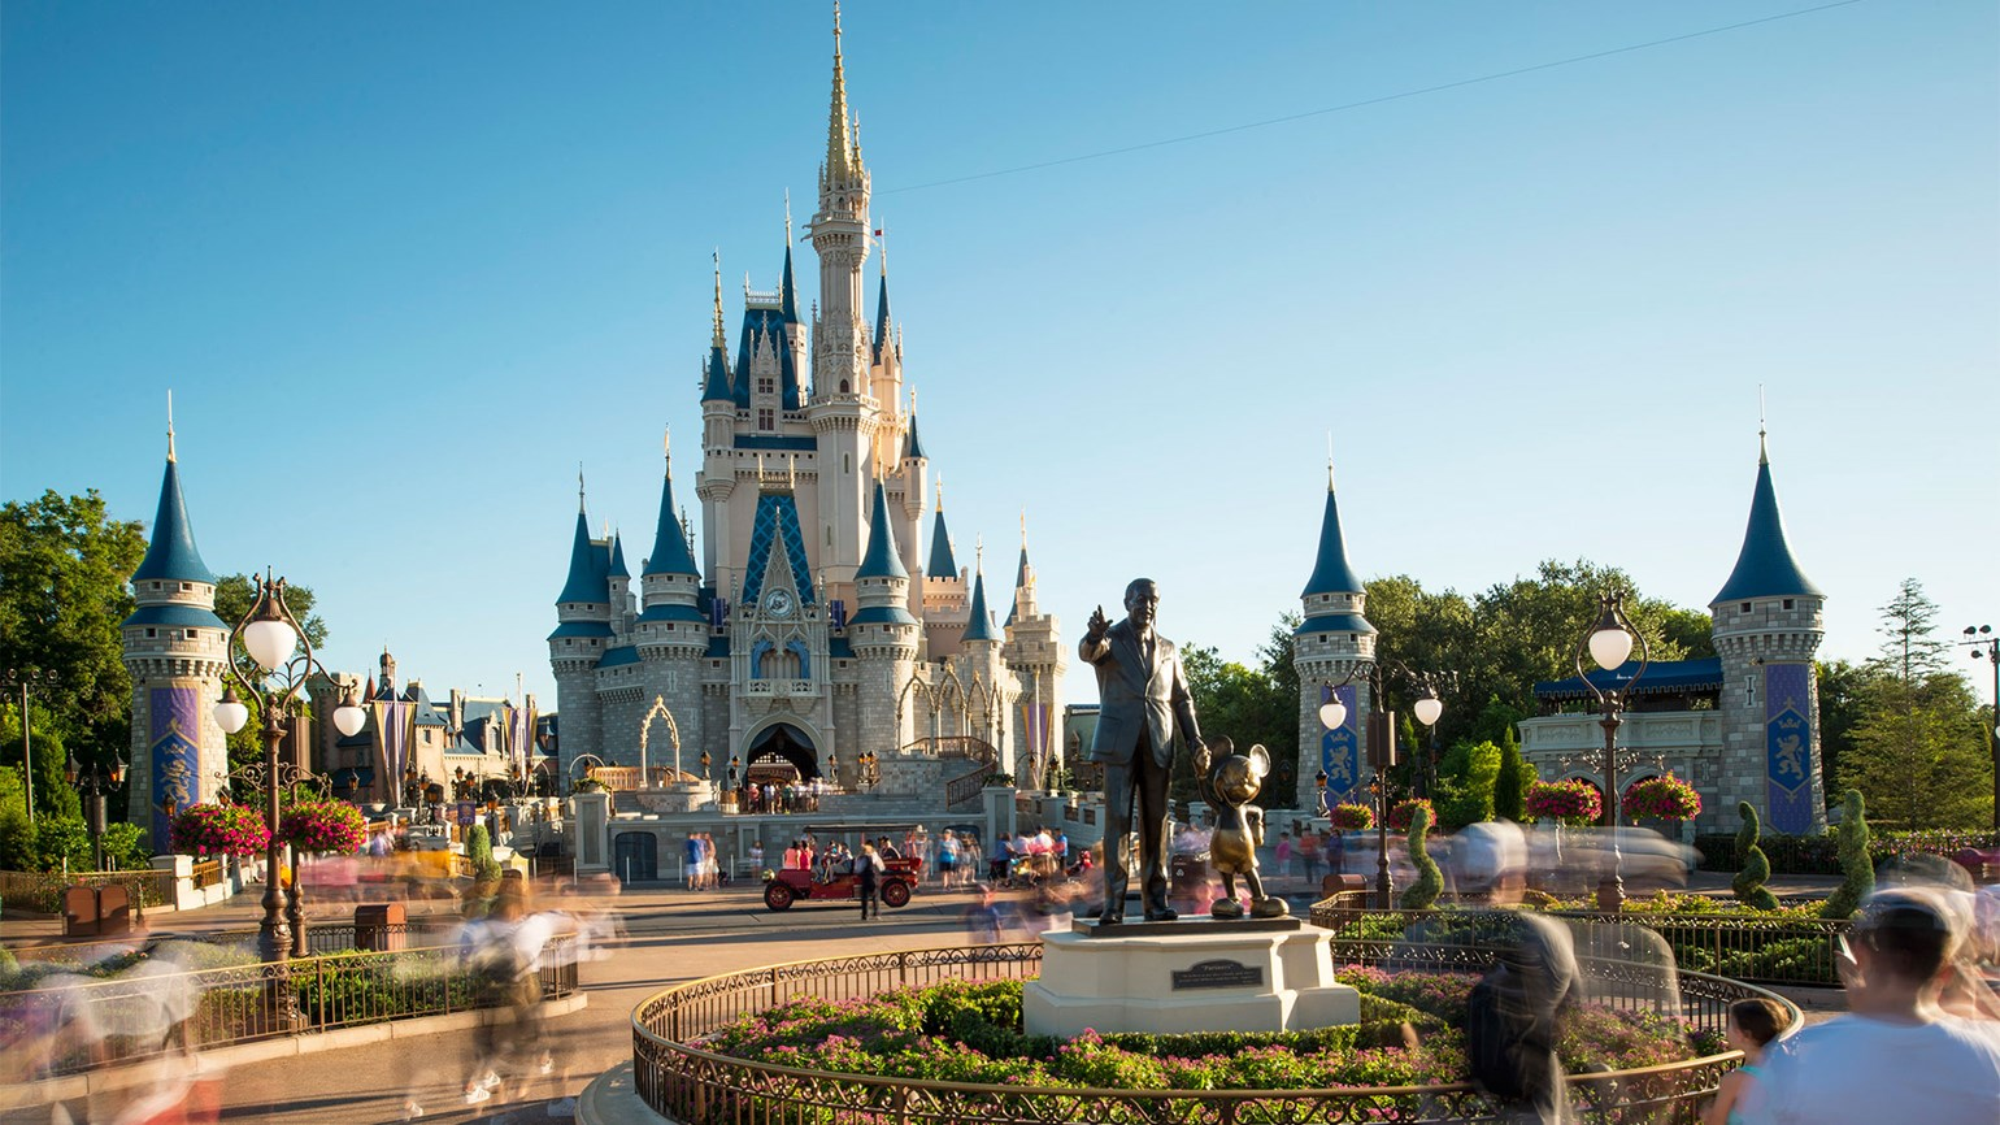 Disney : losing magic in the middle kingdom